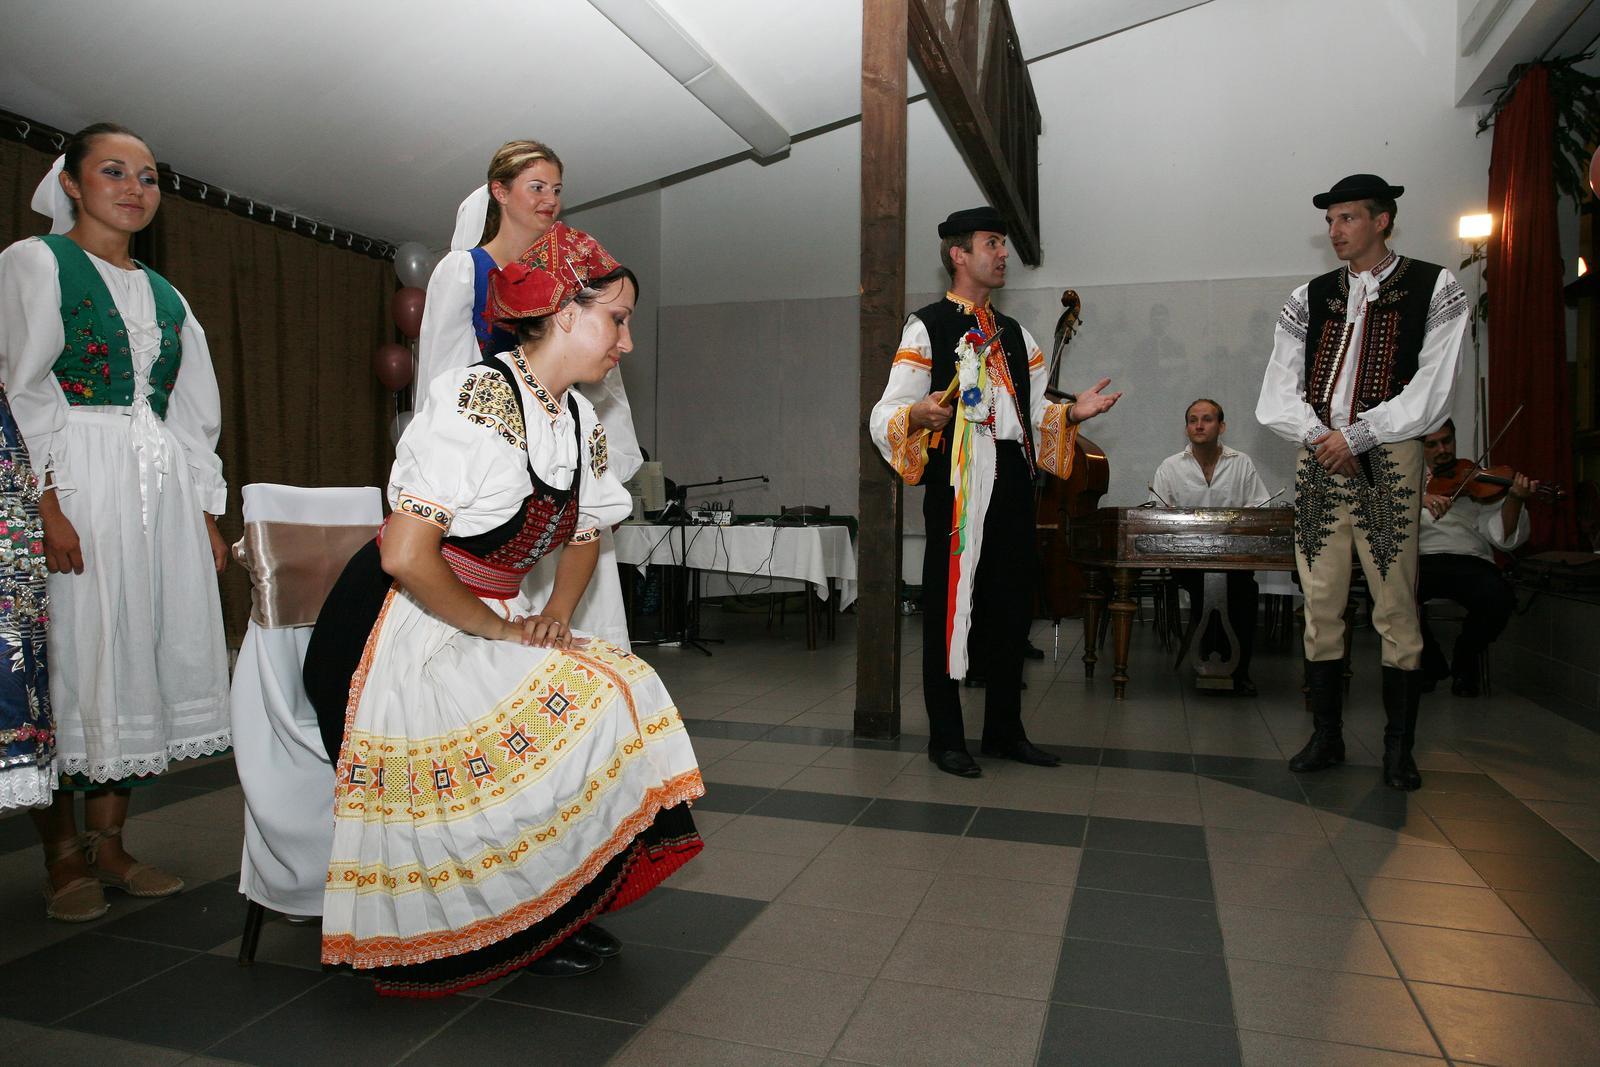 Svadba Bratislava/Ivanka pri Dunaji - Obrázok č. 40